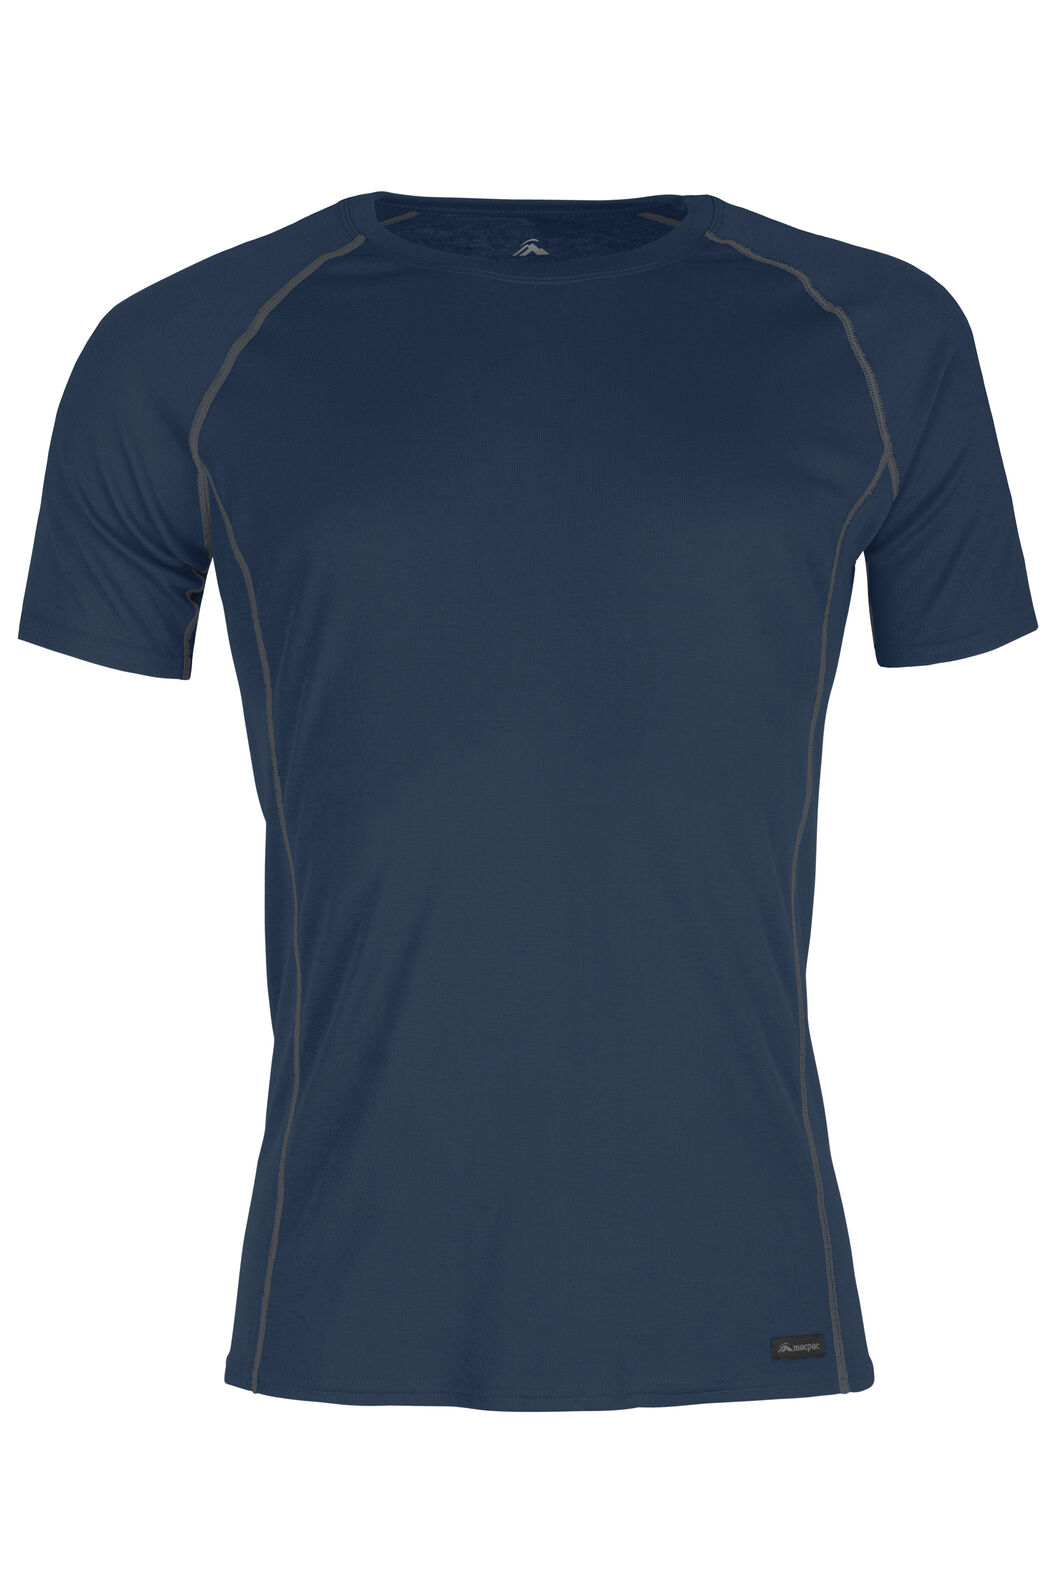 Geothermal Short Sleeve Top - Men's, Carbon, hi-res